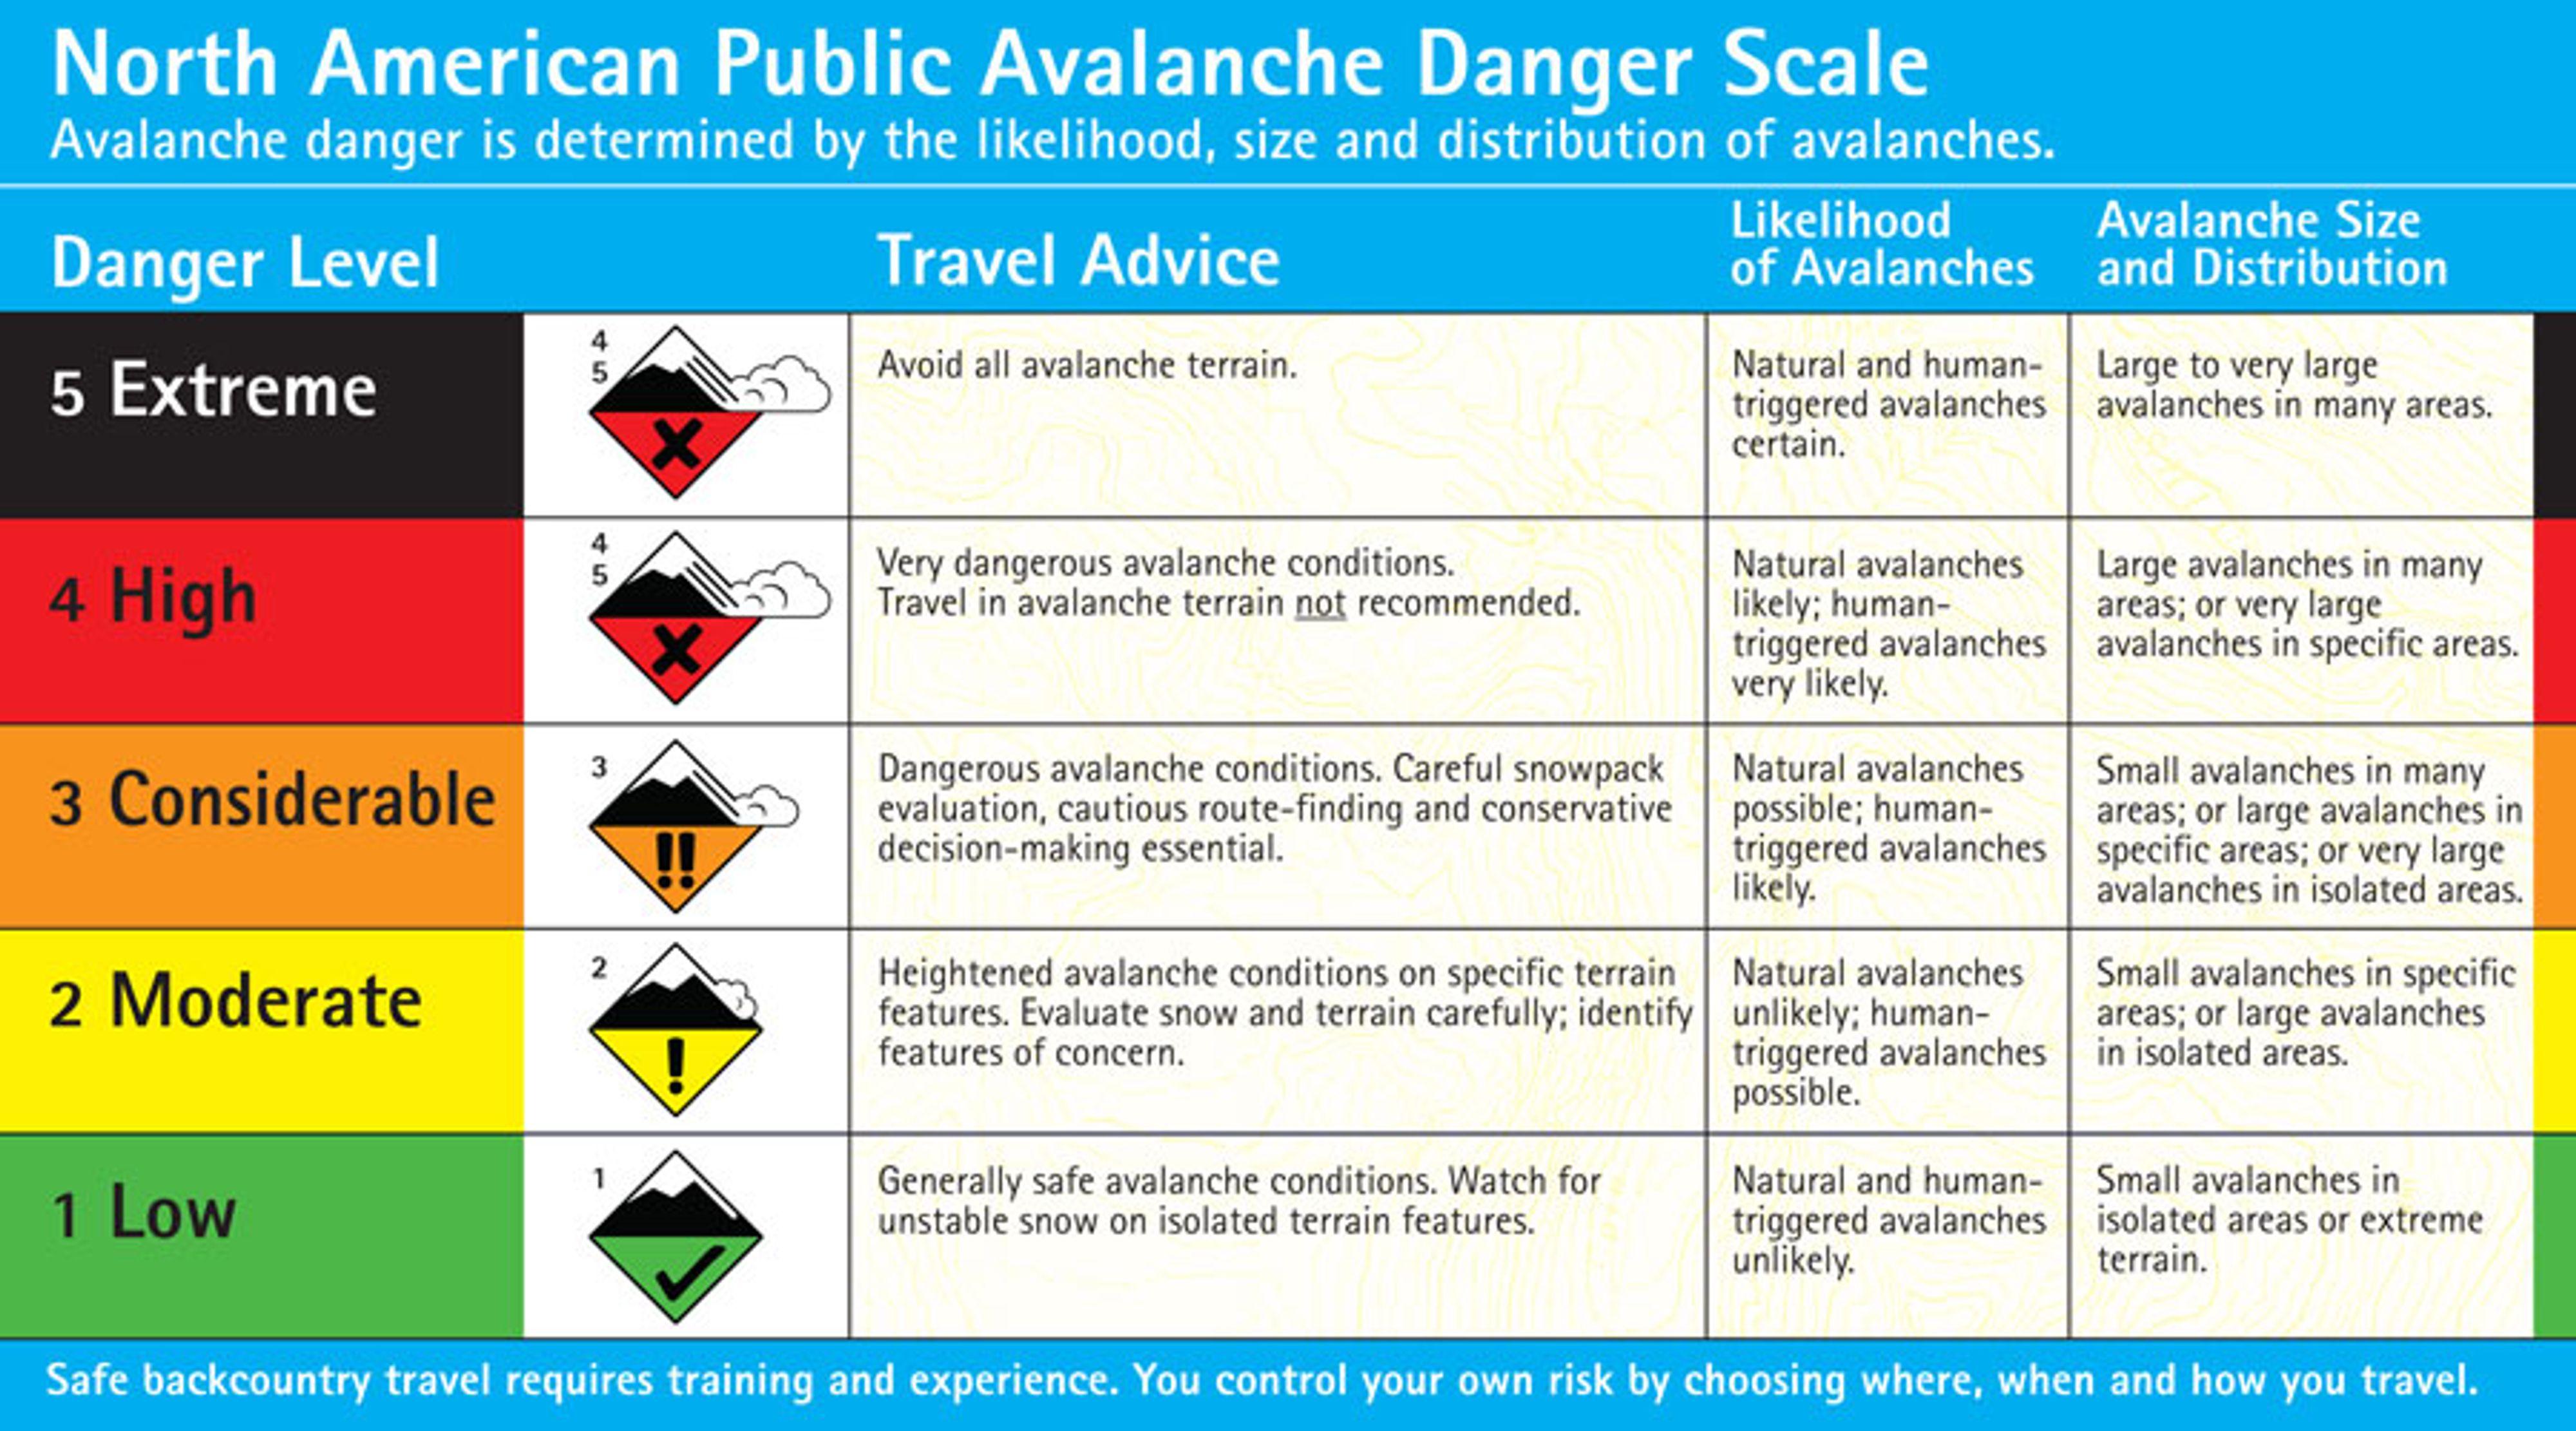 The North American Public Avalanche Danger Scale